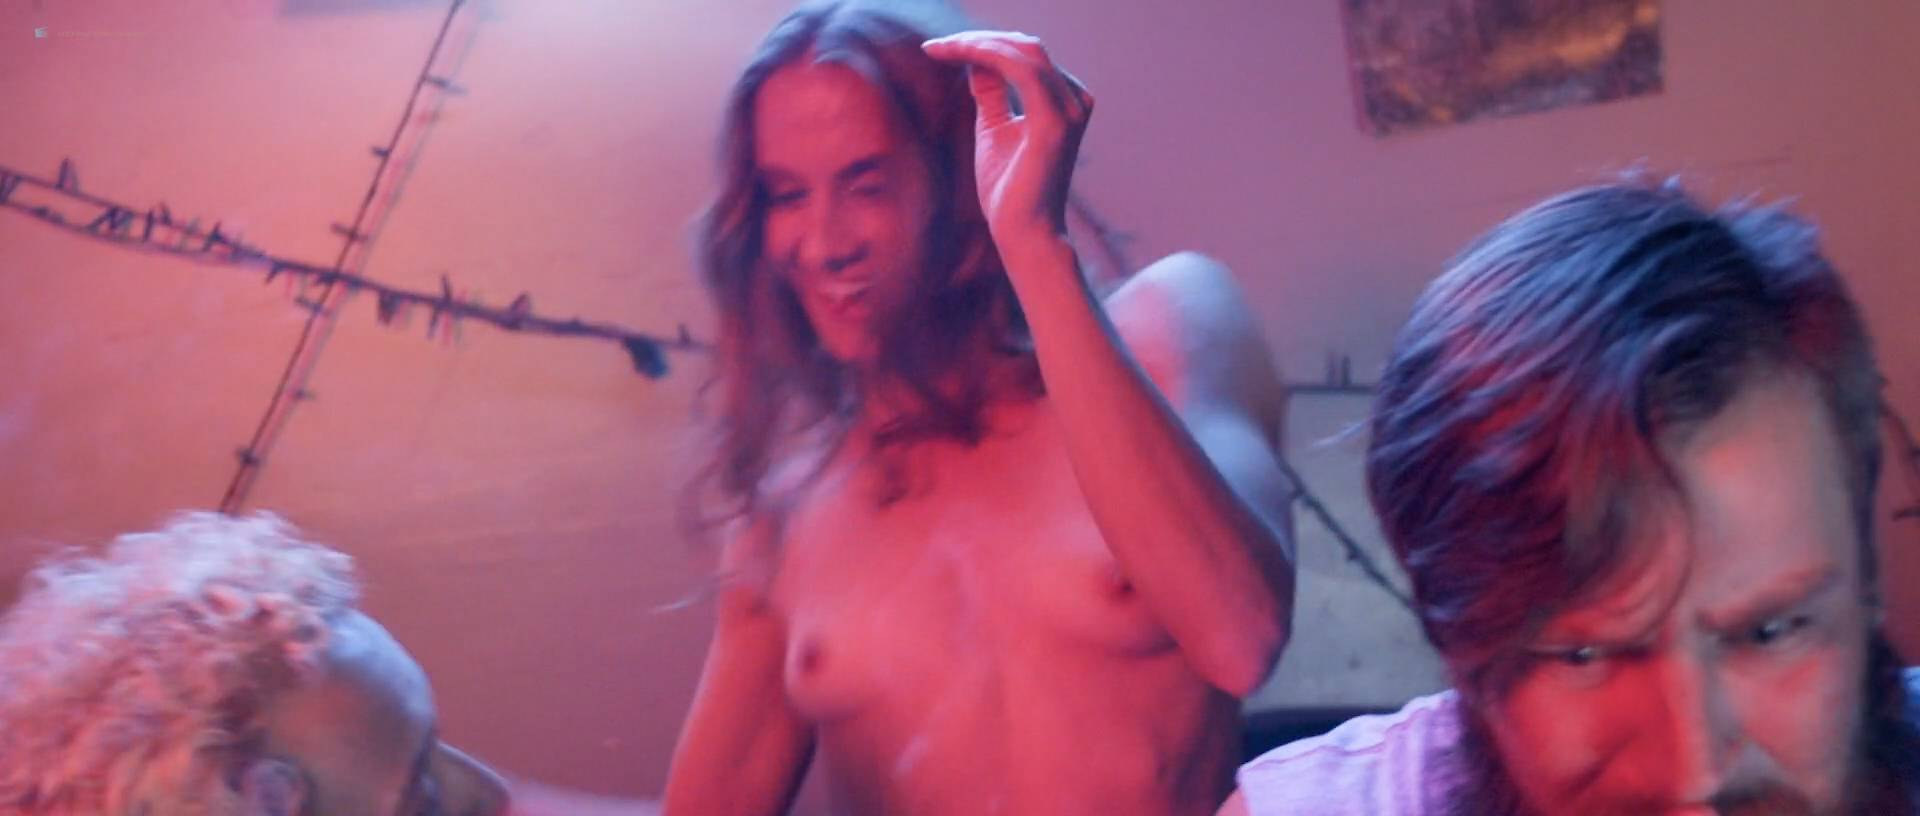 Sara-Malakul-Lane-nude-toples-Kelly-McCart-and-Amanda-Ruth-Ritchie-nude-too-Halloween-Pussy-Trap-Kill-Kill-2017-HD-1080p-Web-009.jpg